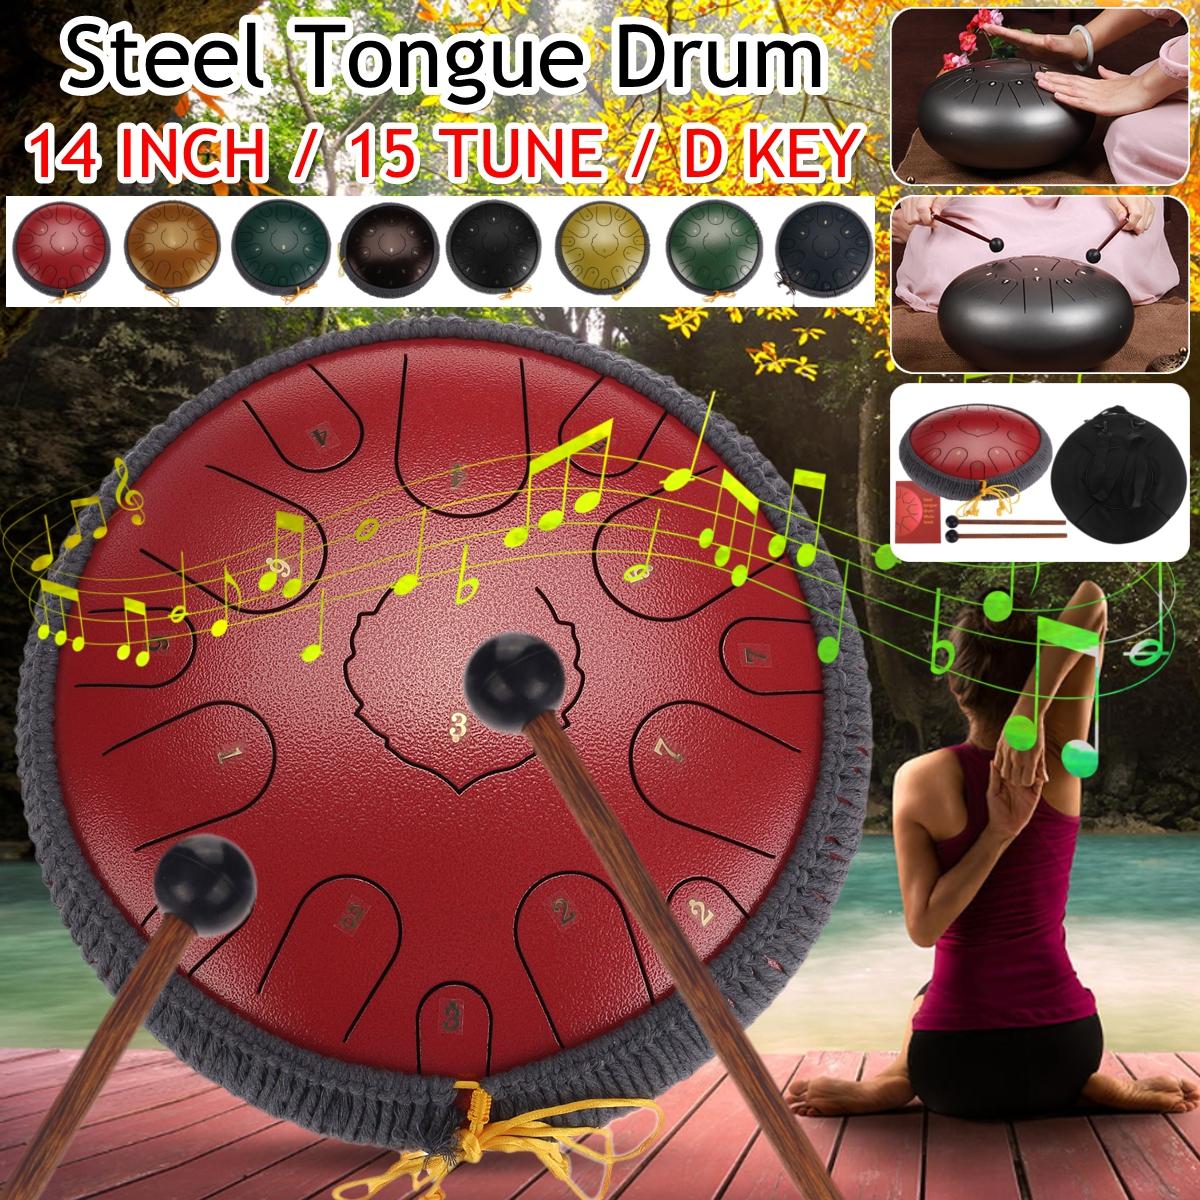 NEW Steel Tongue Drum 13 inch 15 tone Drum Handheld Tank Drum Percussion Instrument Yoga Meditation Beginner Music Lovers Gift Malaysia